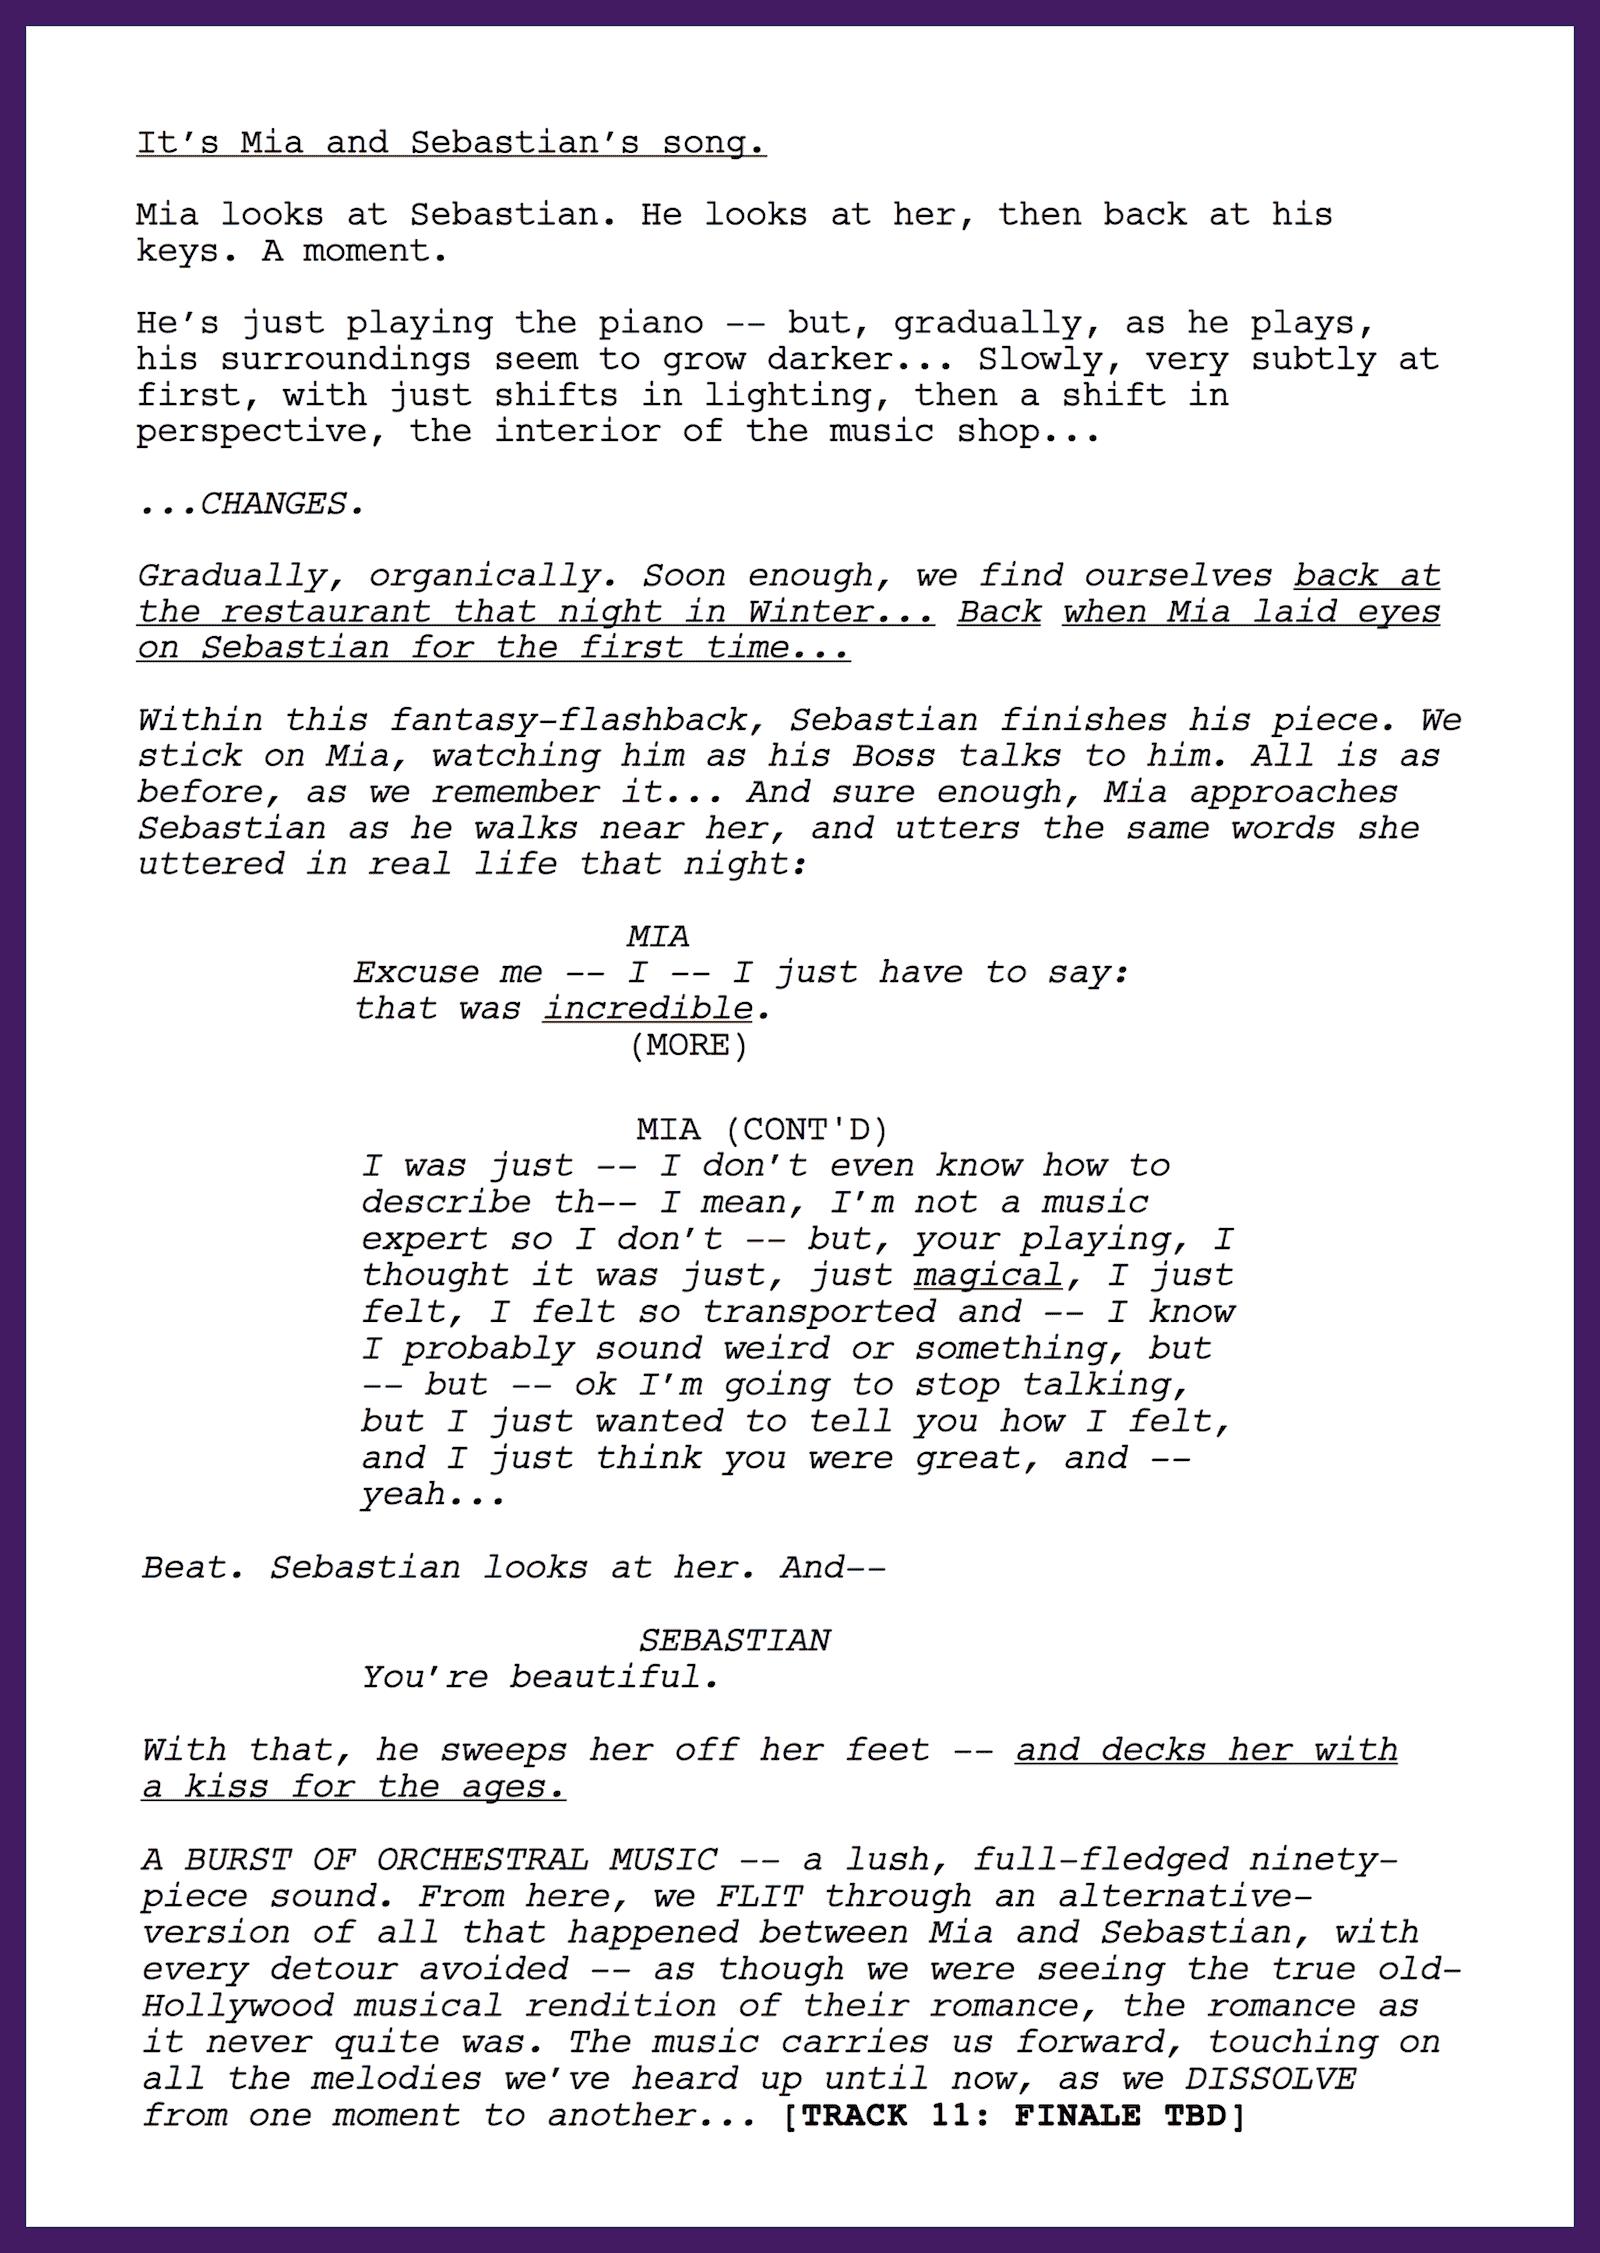 La-La-Land-Script-Sebastian-Playing-Piano-StudioBinder-Scriptwriting-Software